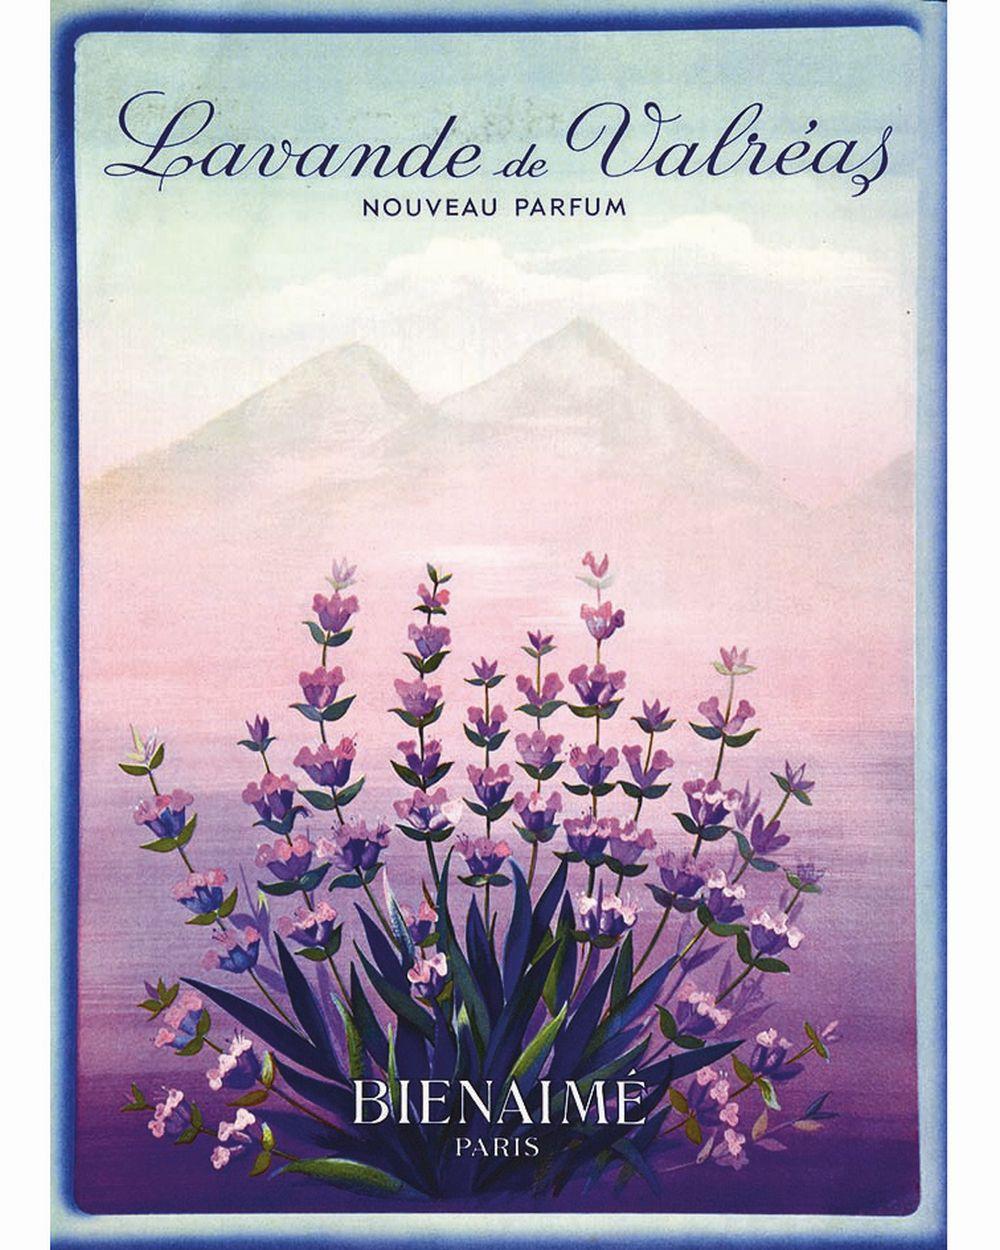 Lavande de Valréas Bien Aimé Parfum     vers 1950  Valréas (Vaucluse)